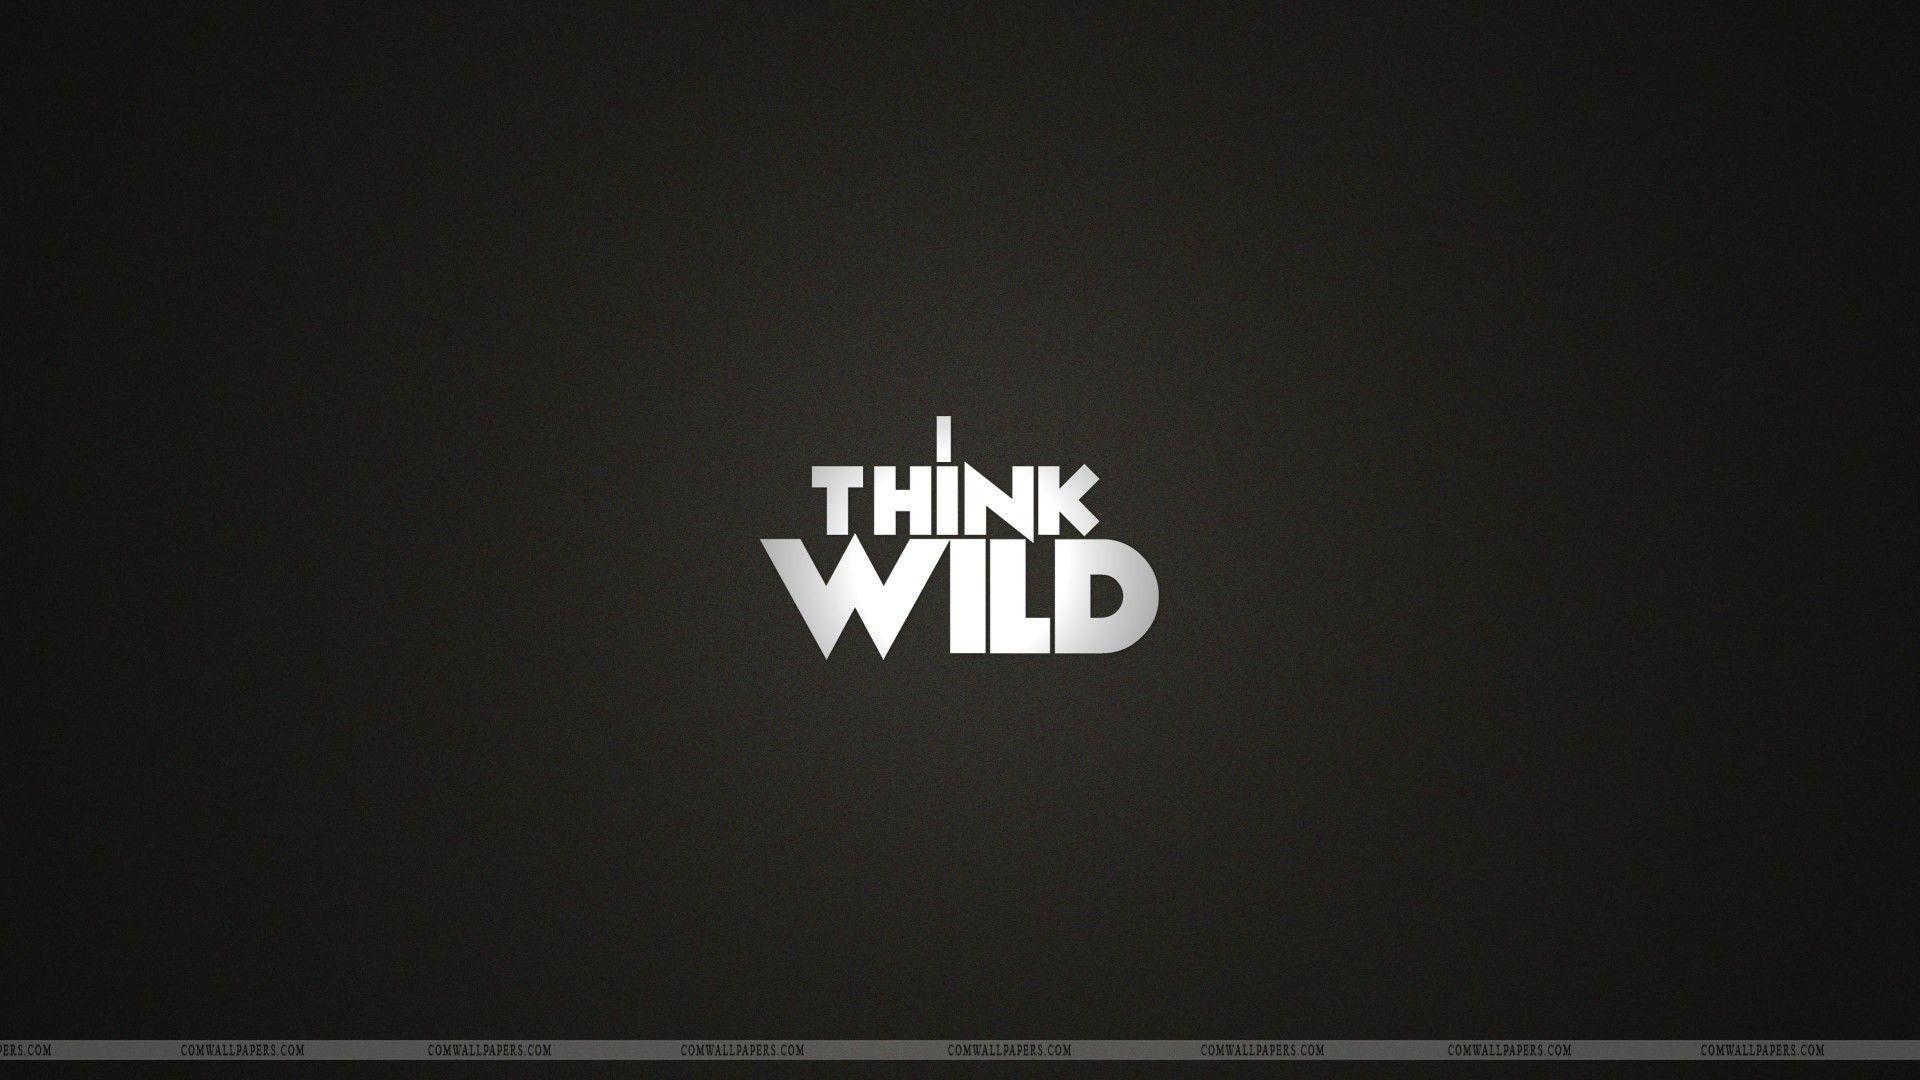 Text Wallpaper: I Think Wild Text Creative Wallpaper